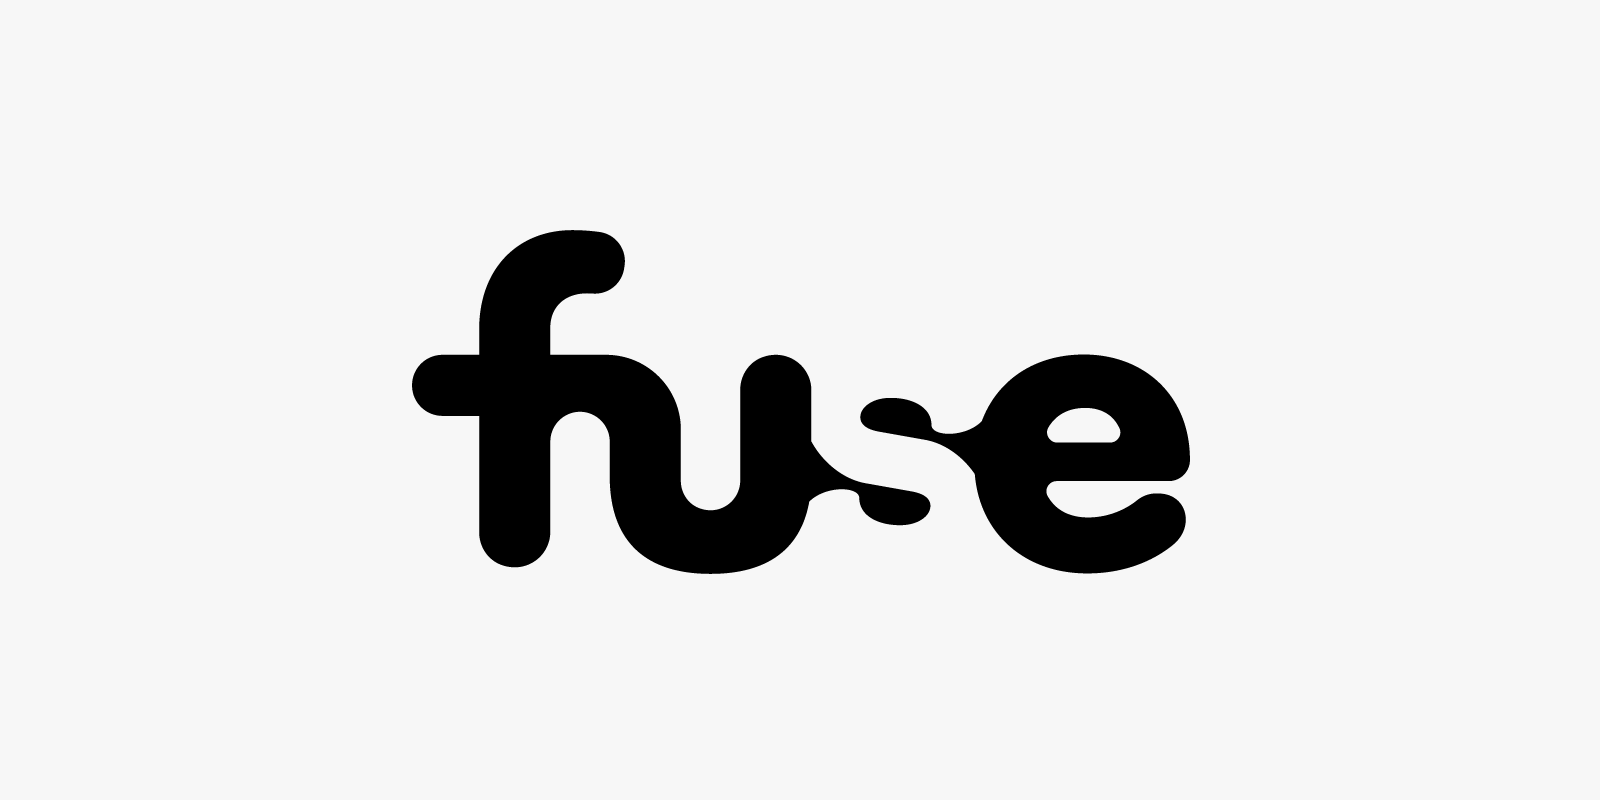 KERNEL][O/N] Fuse-kernel-r1-3 18 106 For Moto E4 Plus